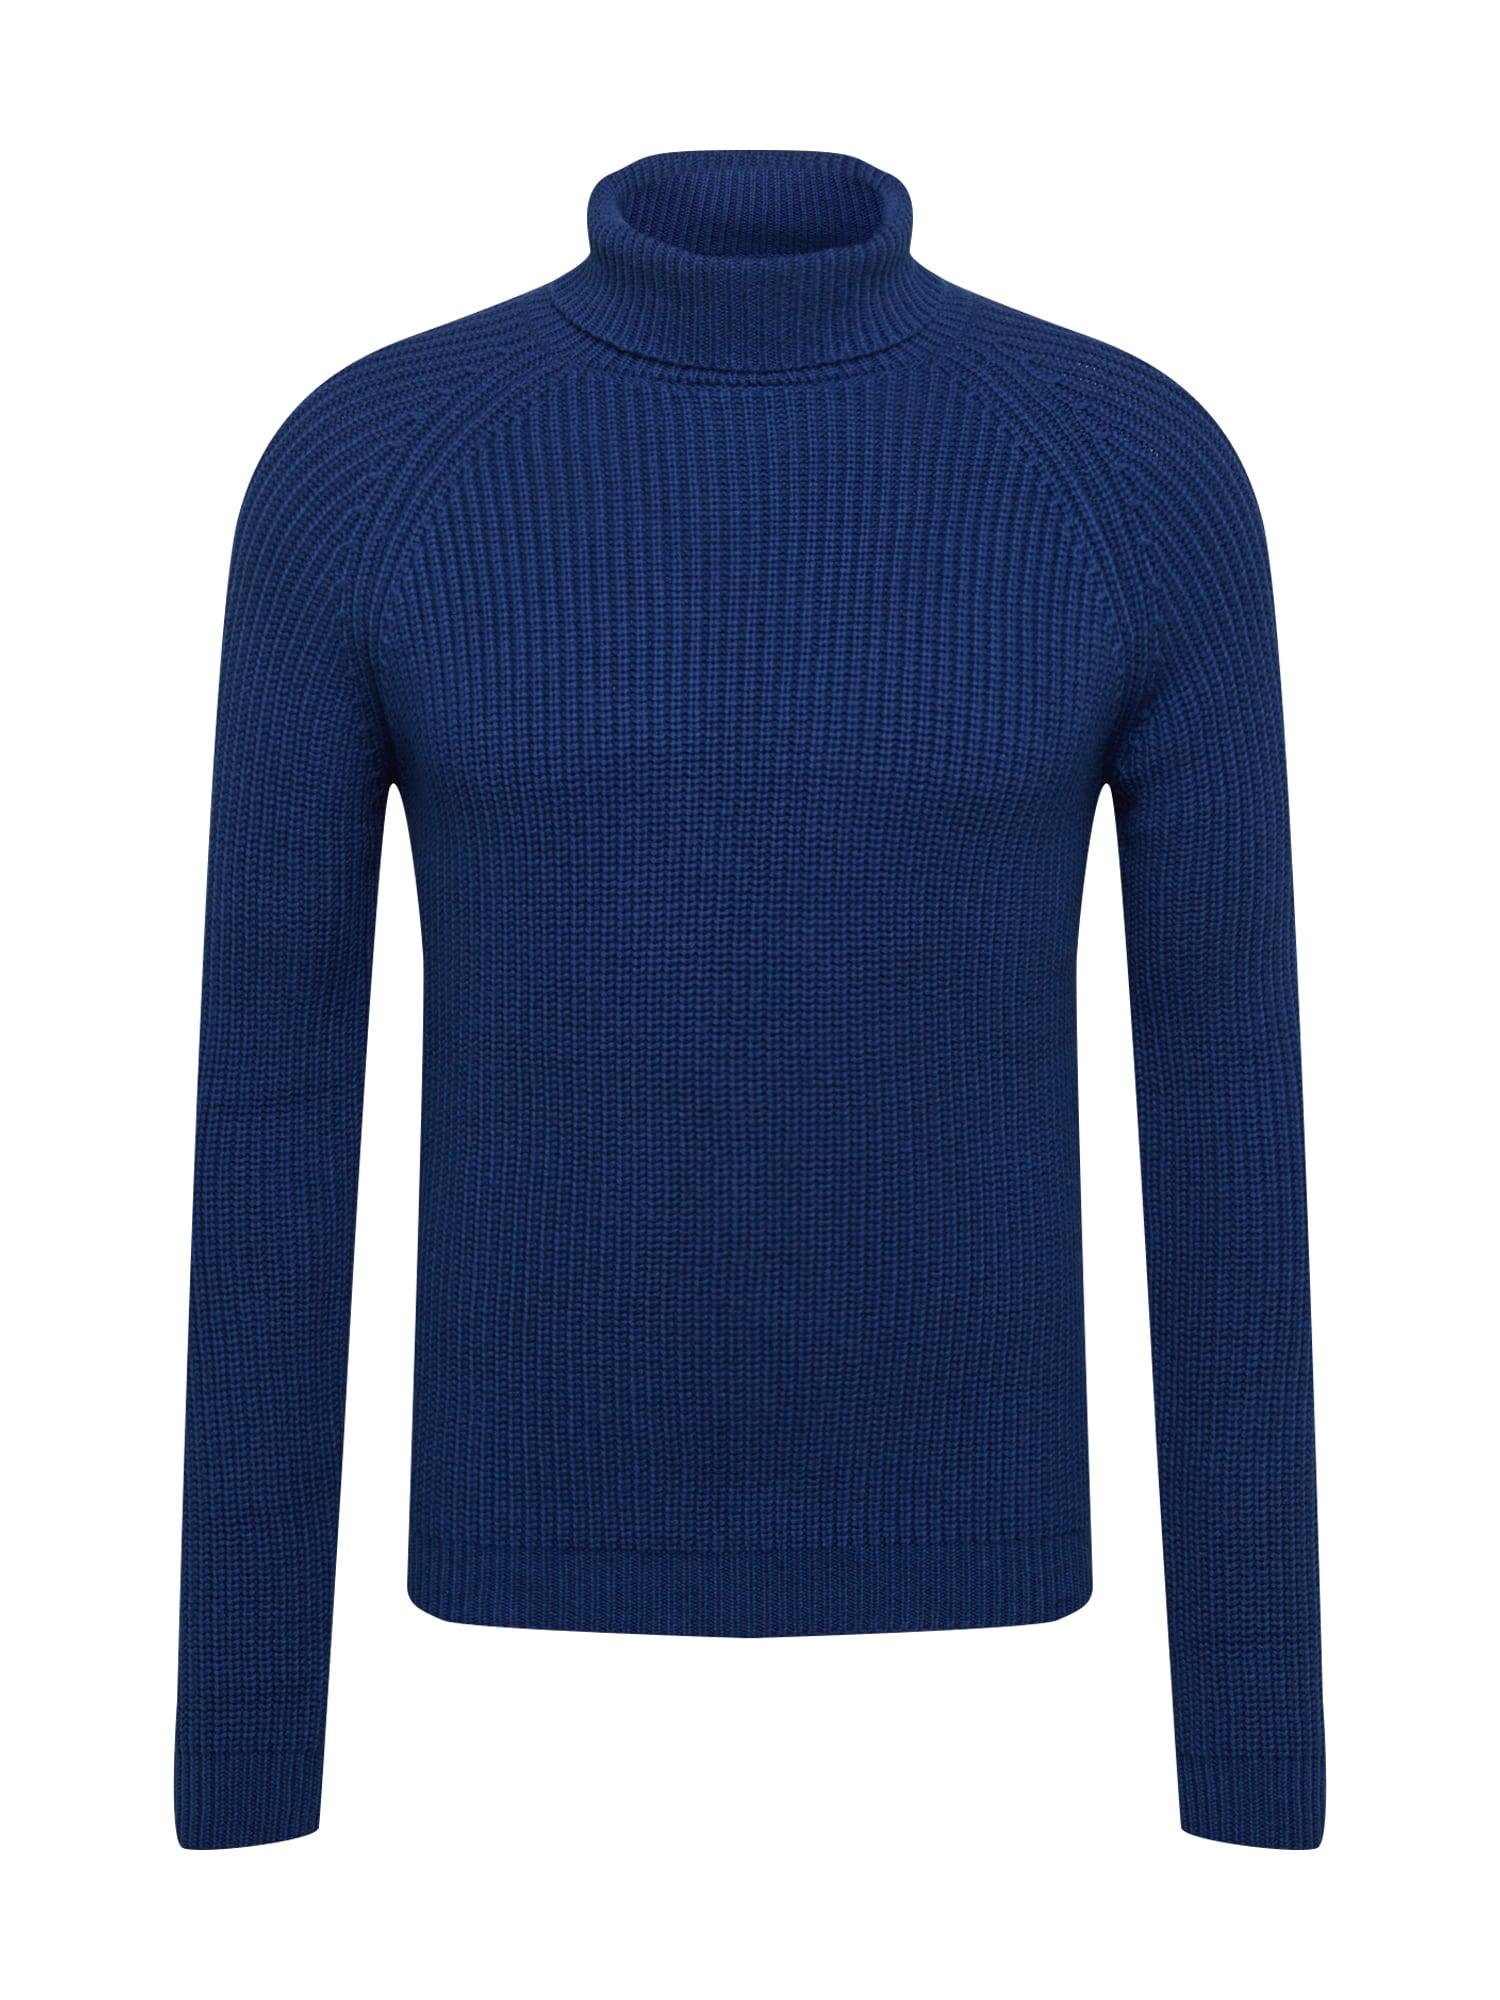 ANTONY MORATO Megztinis tamsiai mėlyna